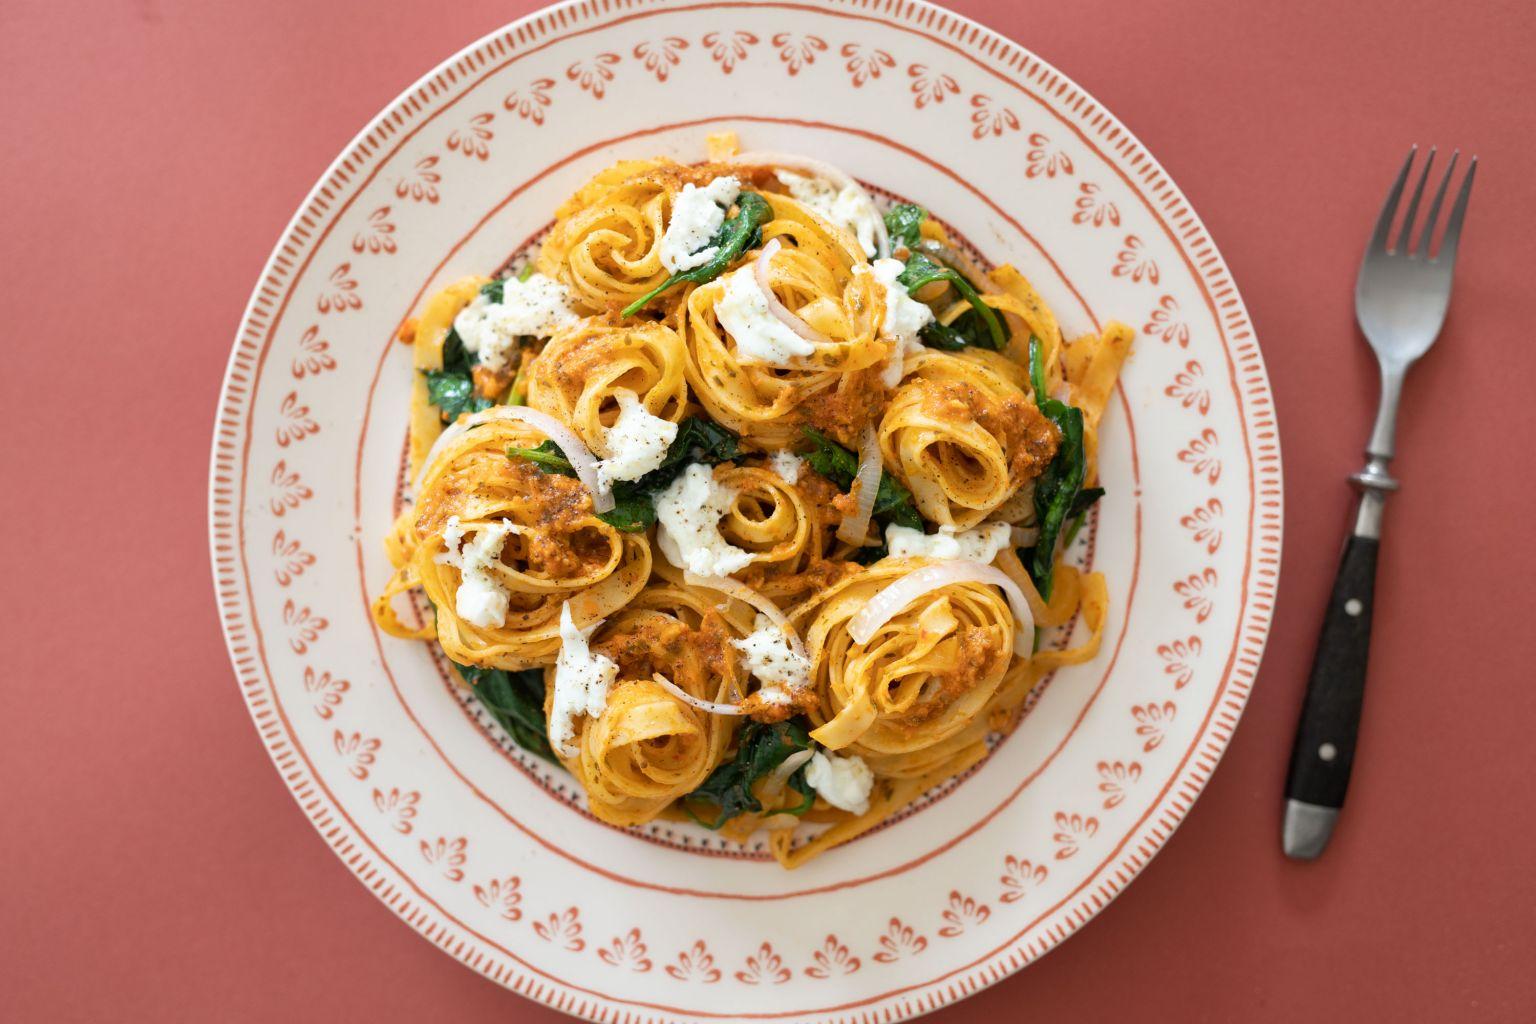 Tagliatelle au pesto pomodoro et mozzarella